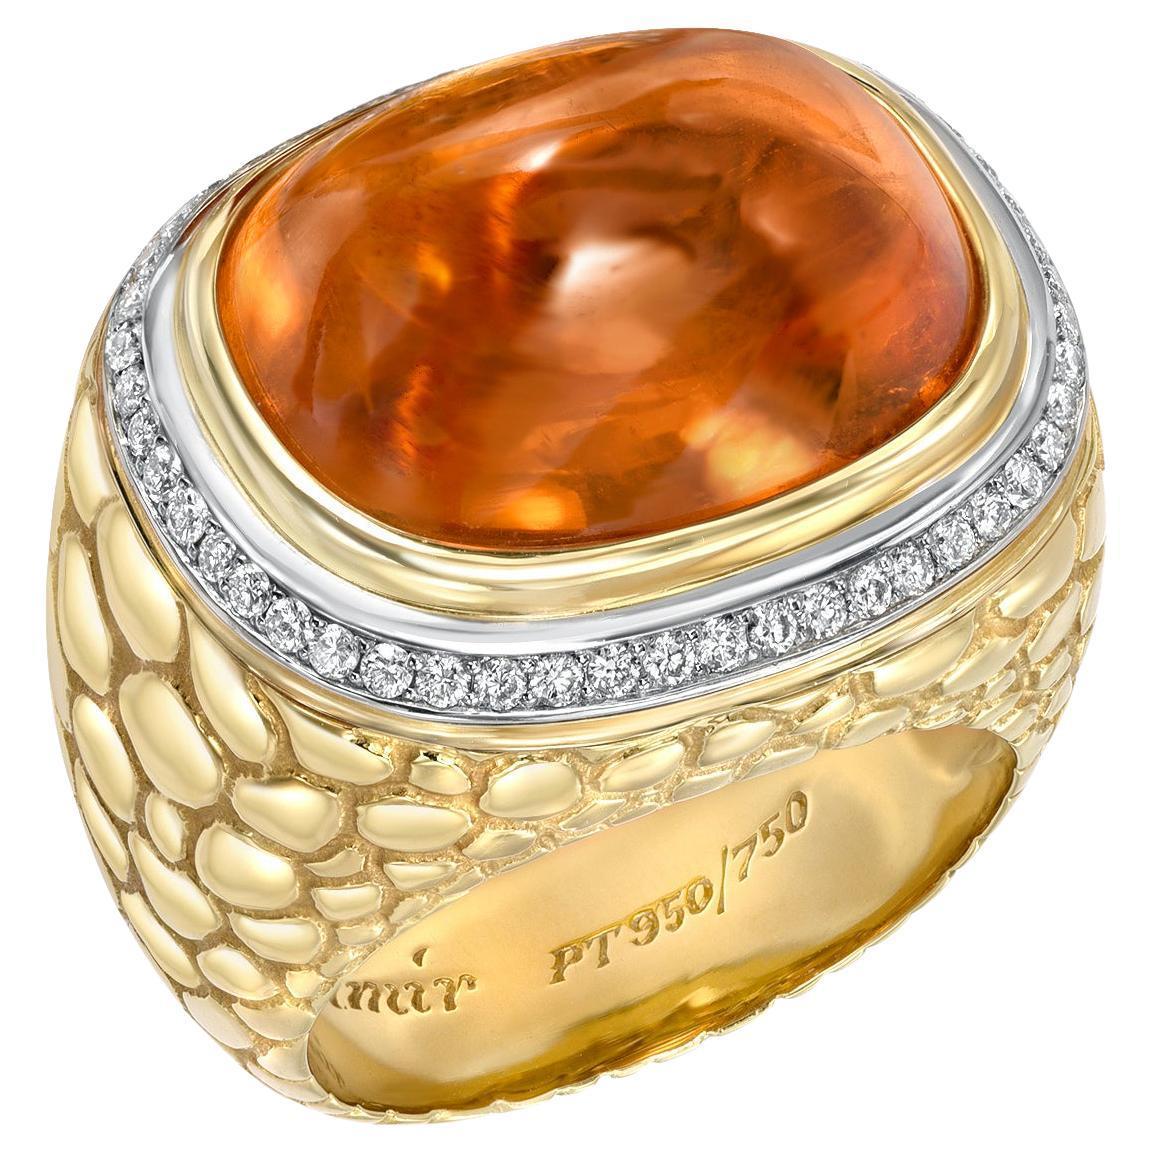 Mandarin Garnet Sugarloaf Cabochon 29.93 Carat Crocodile Ring